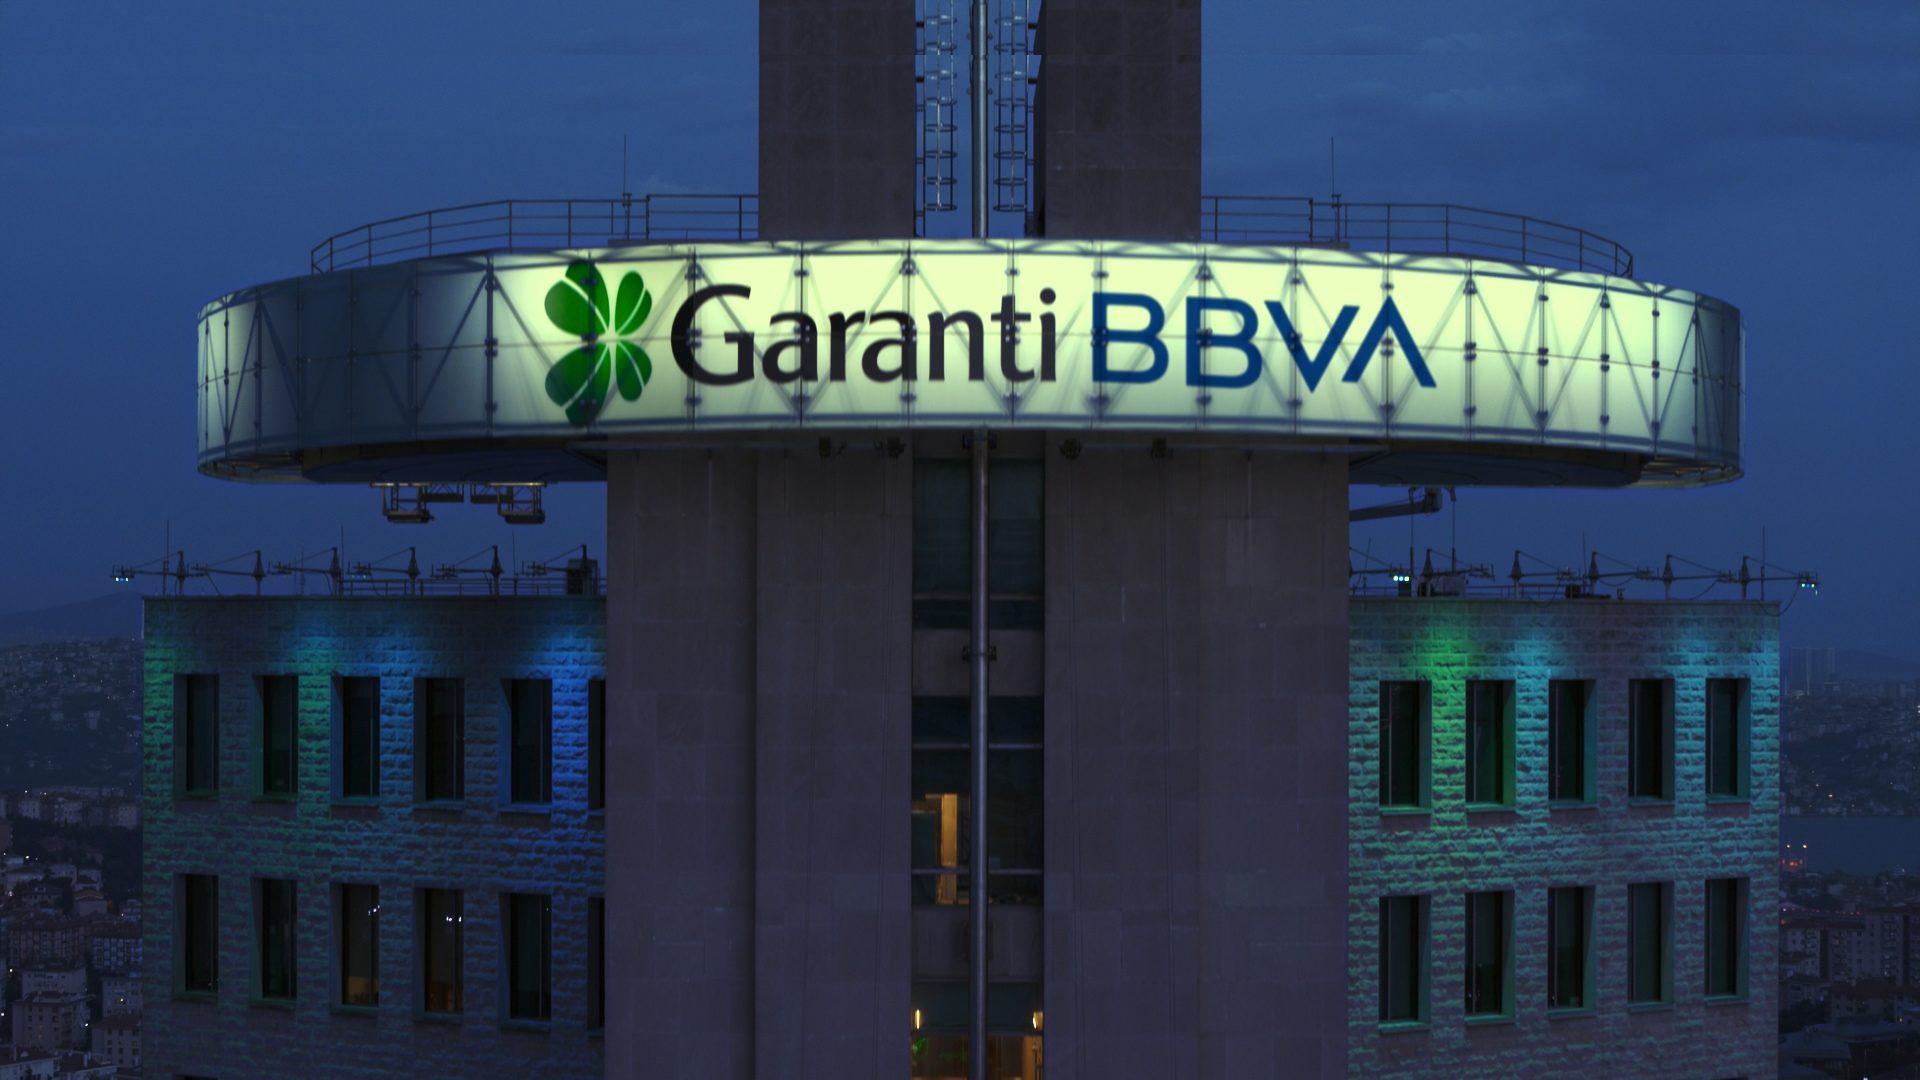 garanti-bbva-brand-logo-istanbul